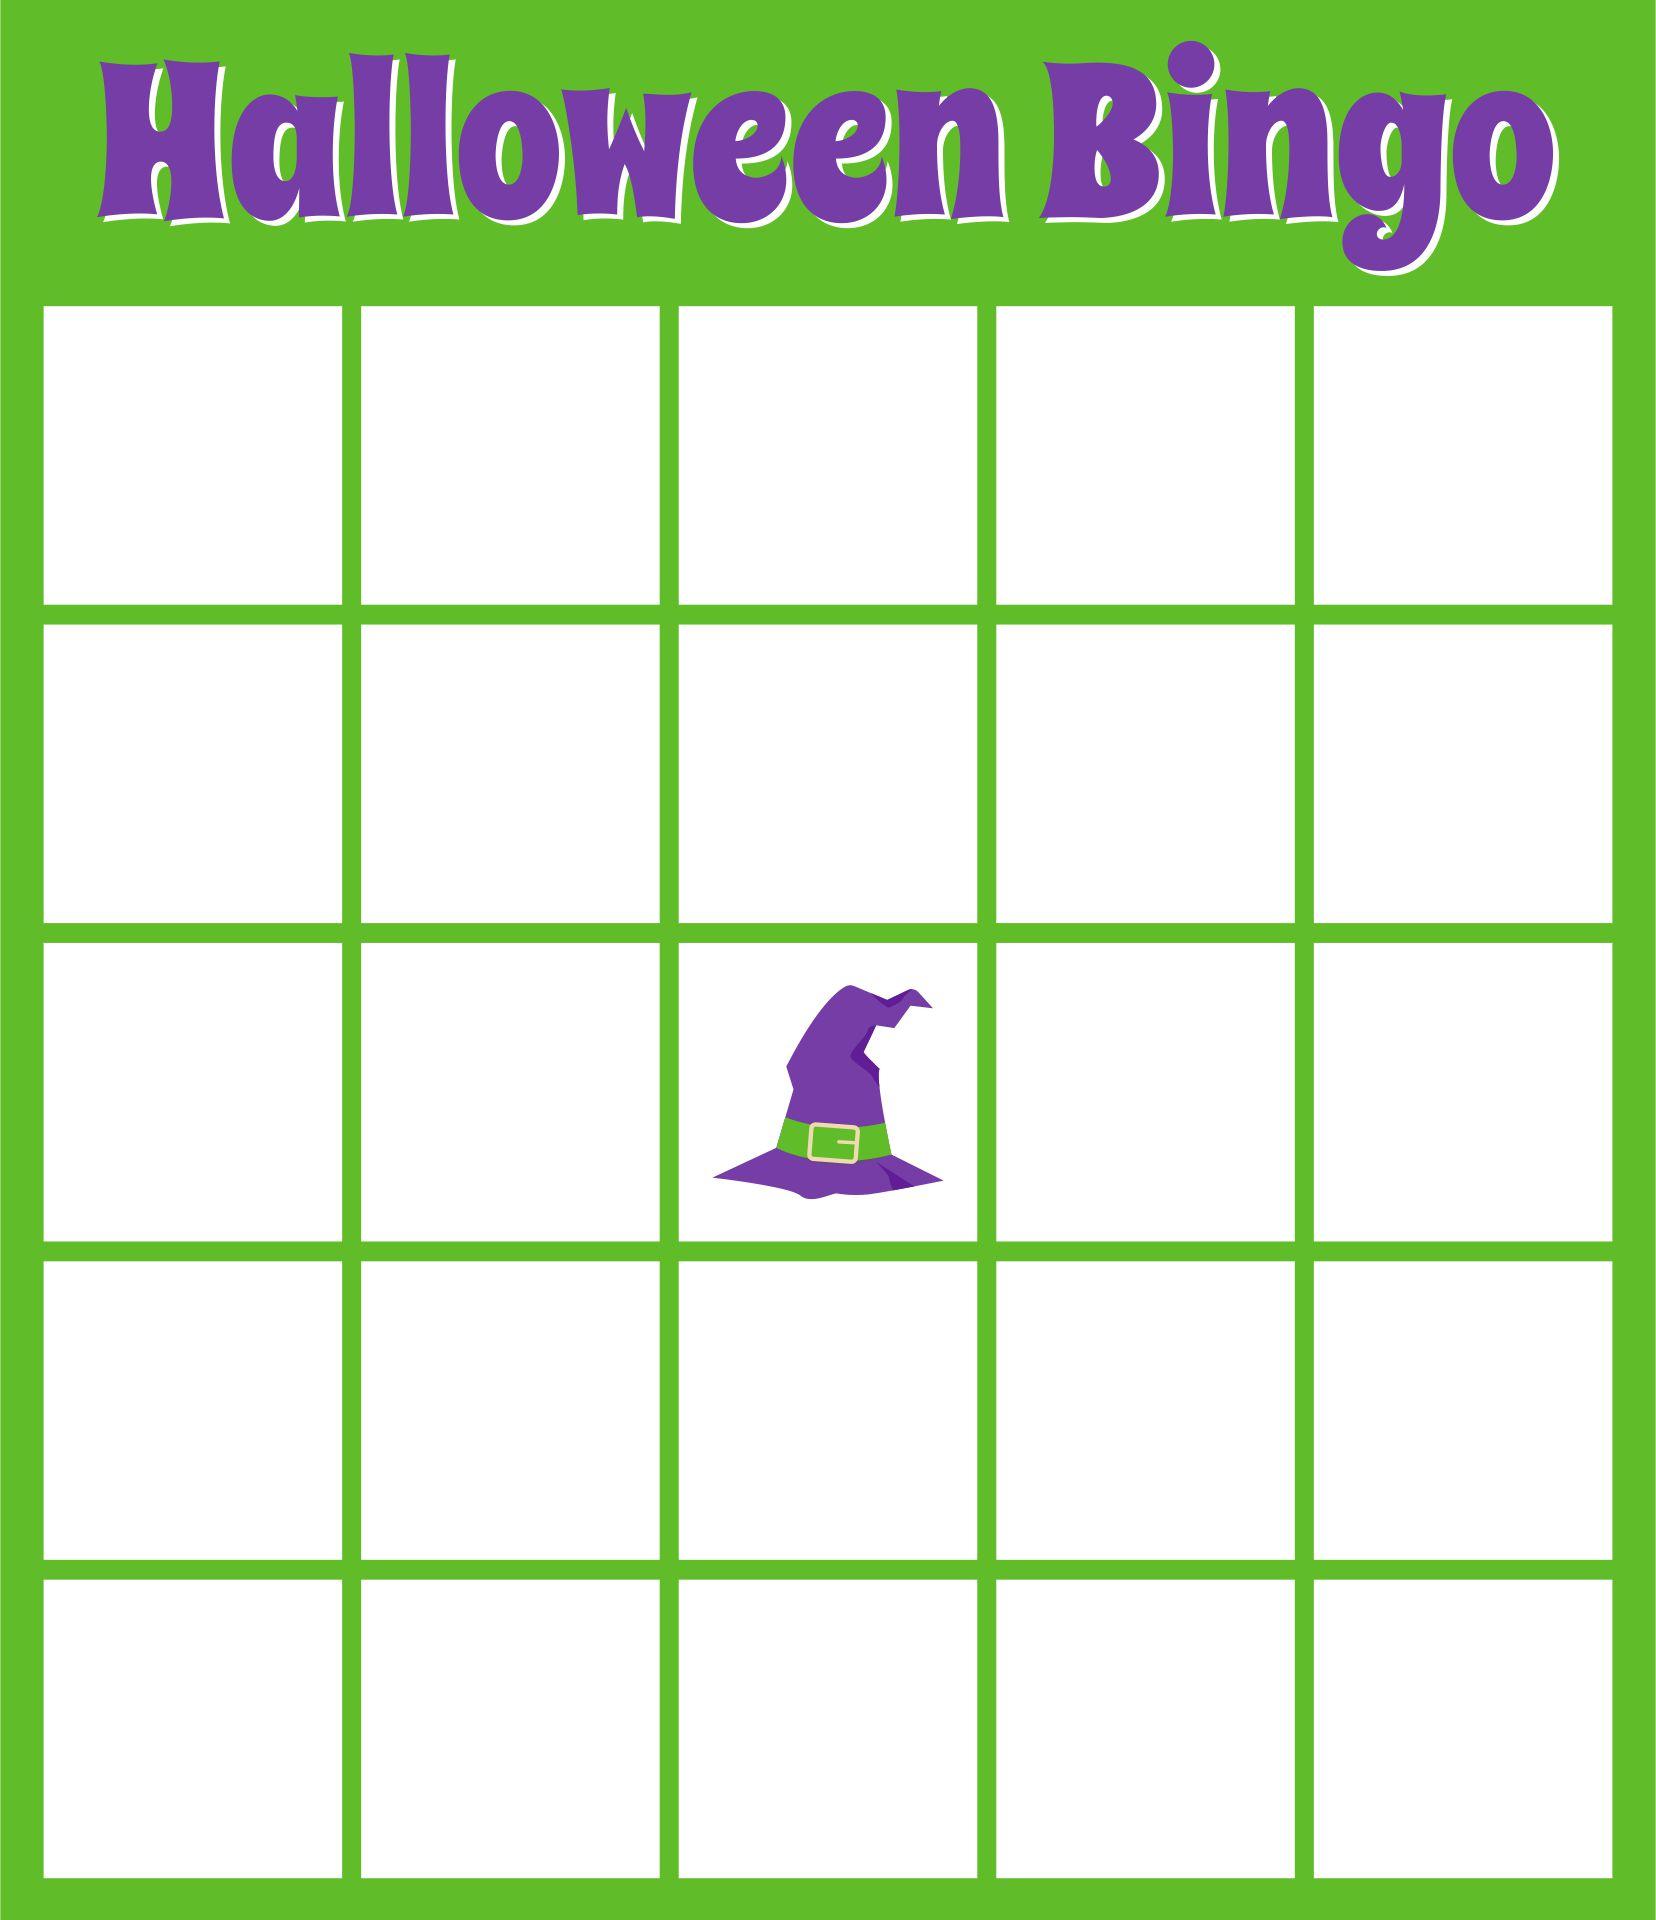 Blank Halloween Bingo Cards Printable